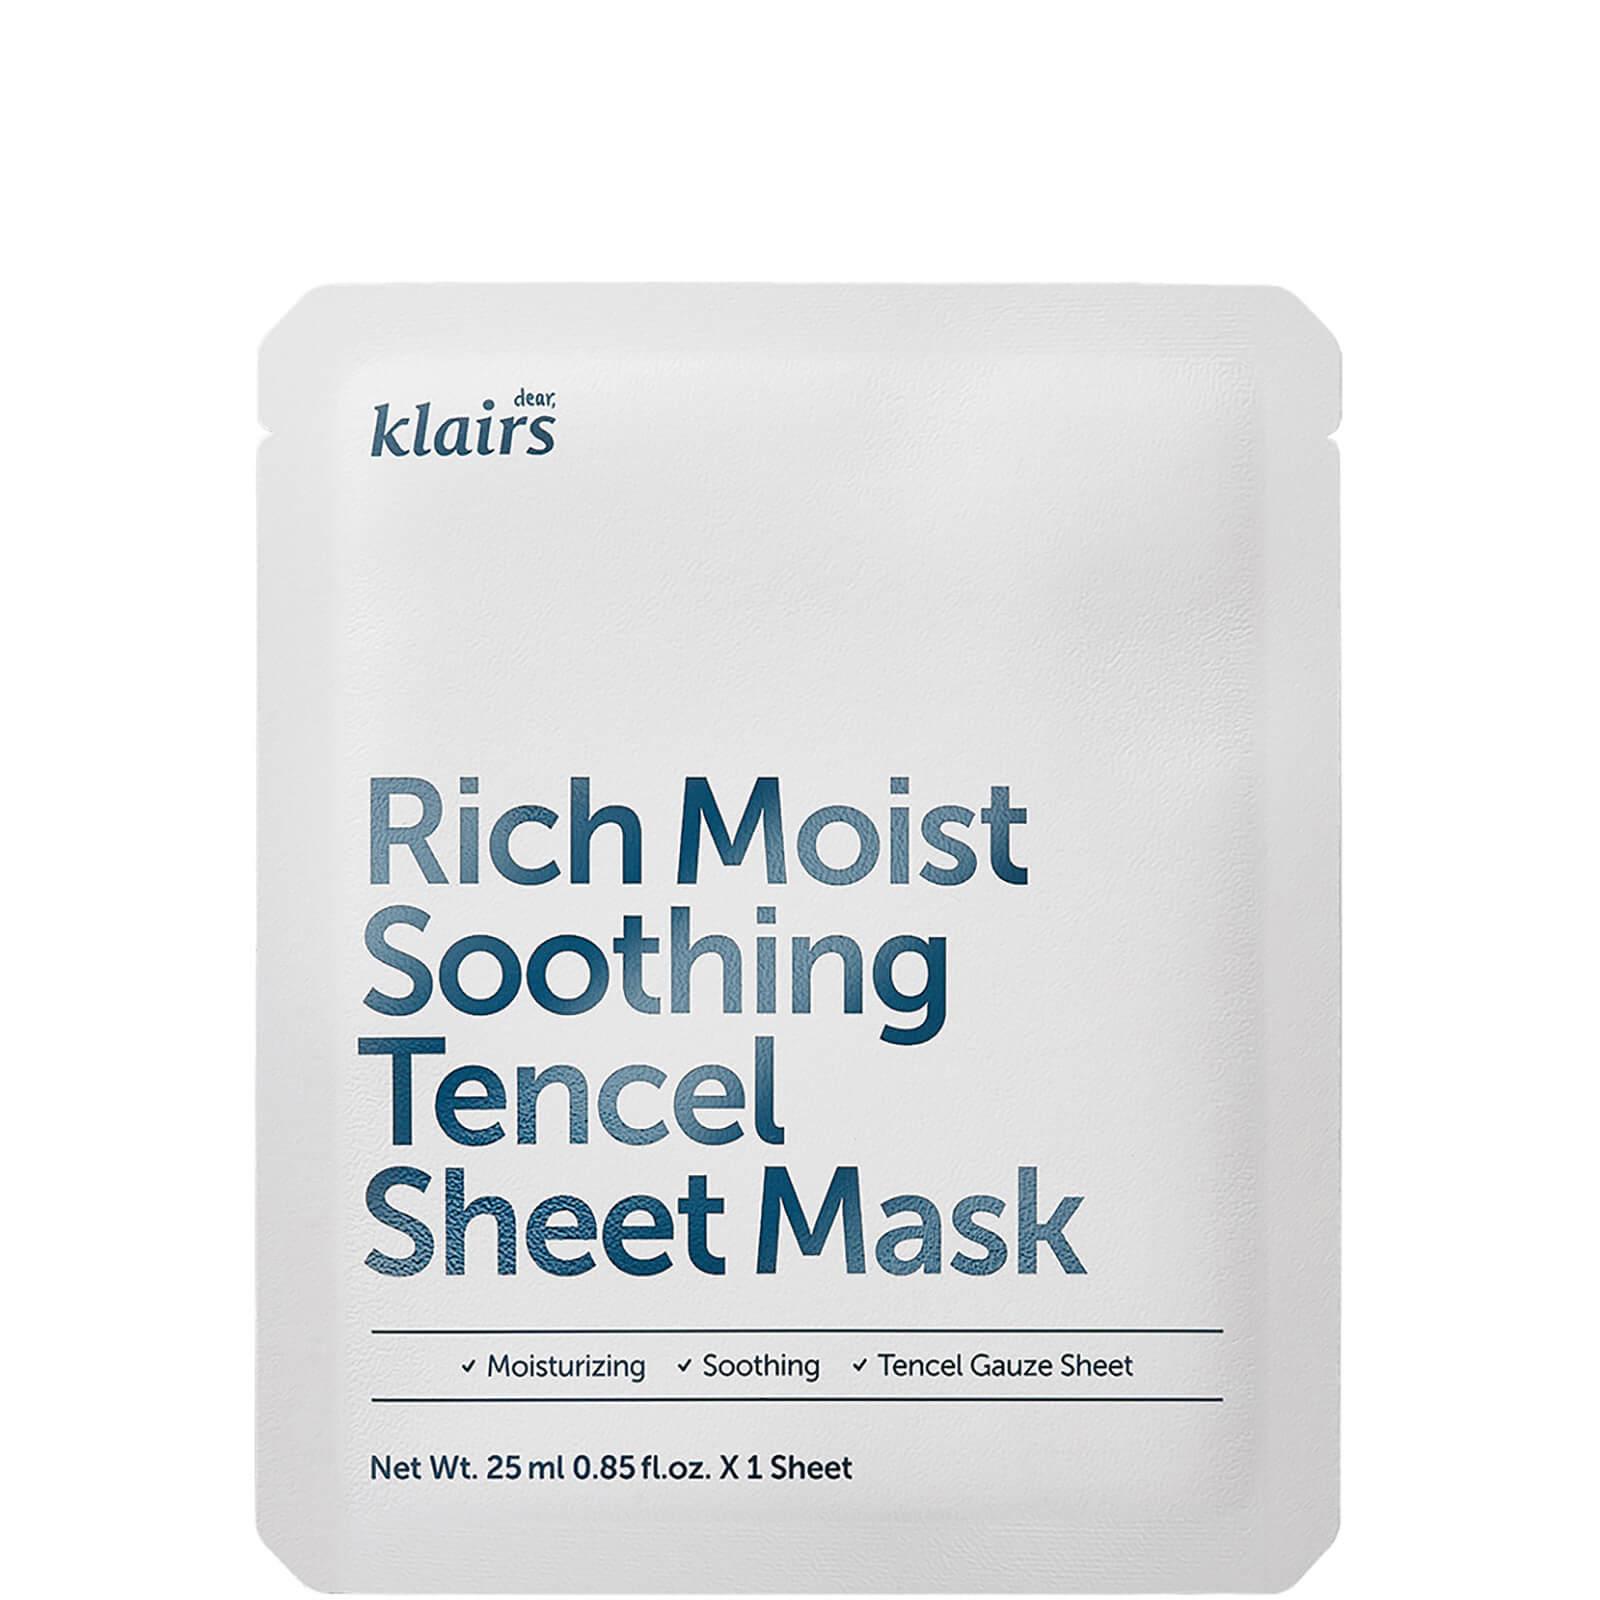 Купить Тканевая маска Dear, Klairs Rich Moist Soothing Tencel Sheet Mask 25ml